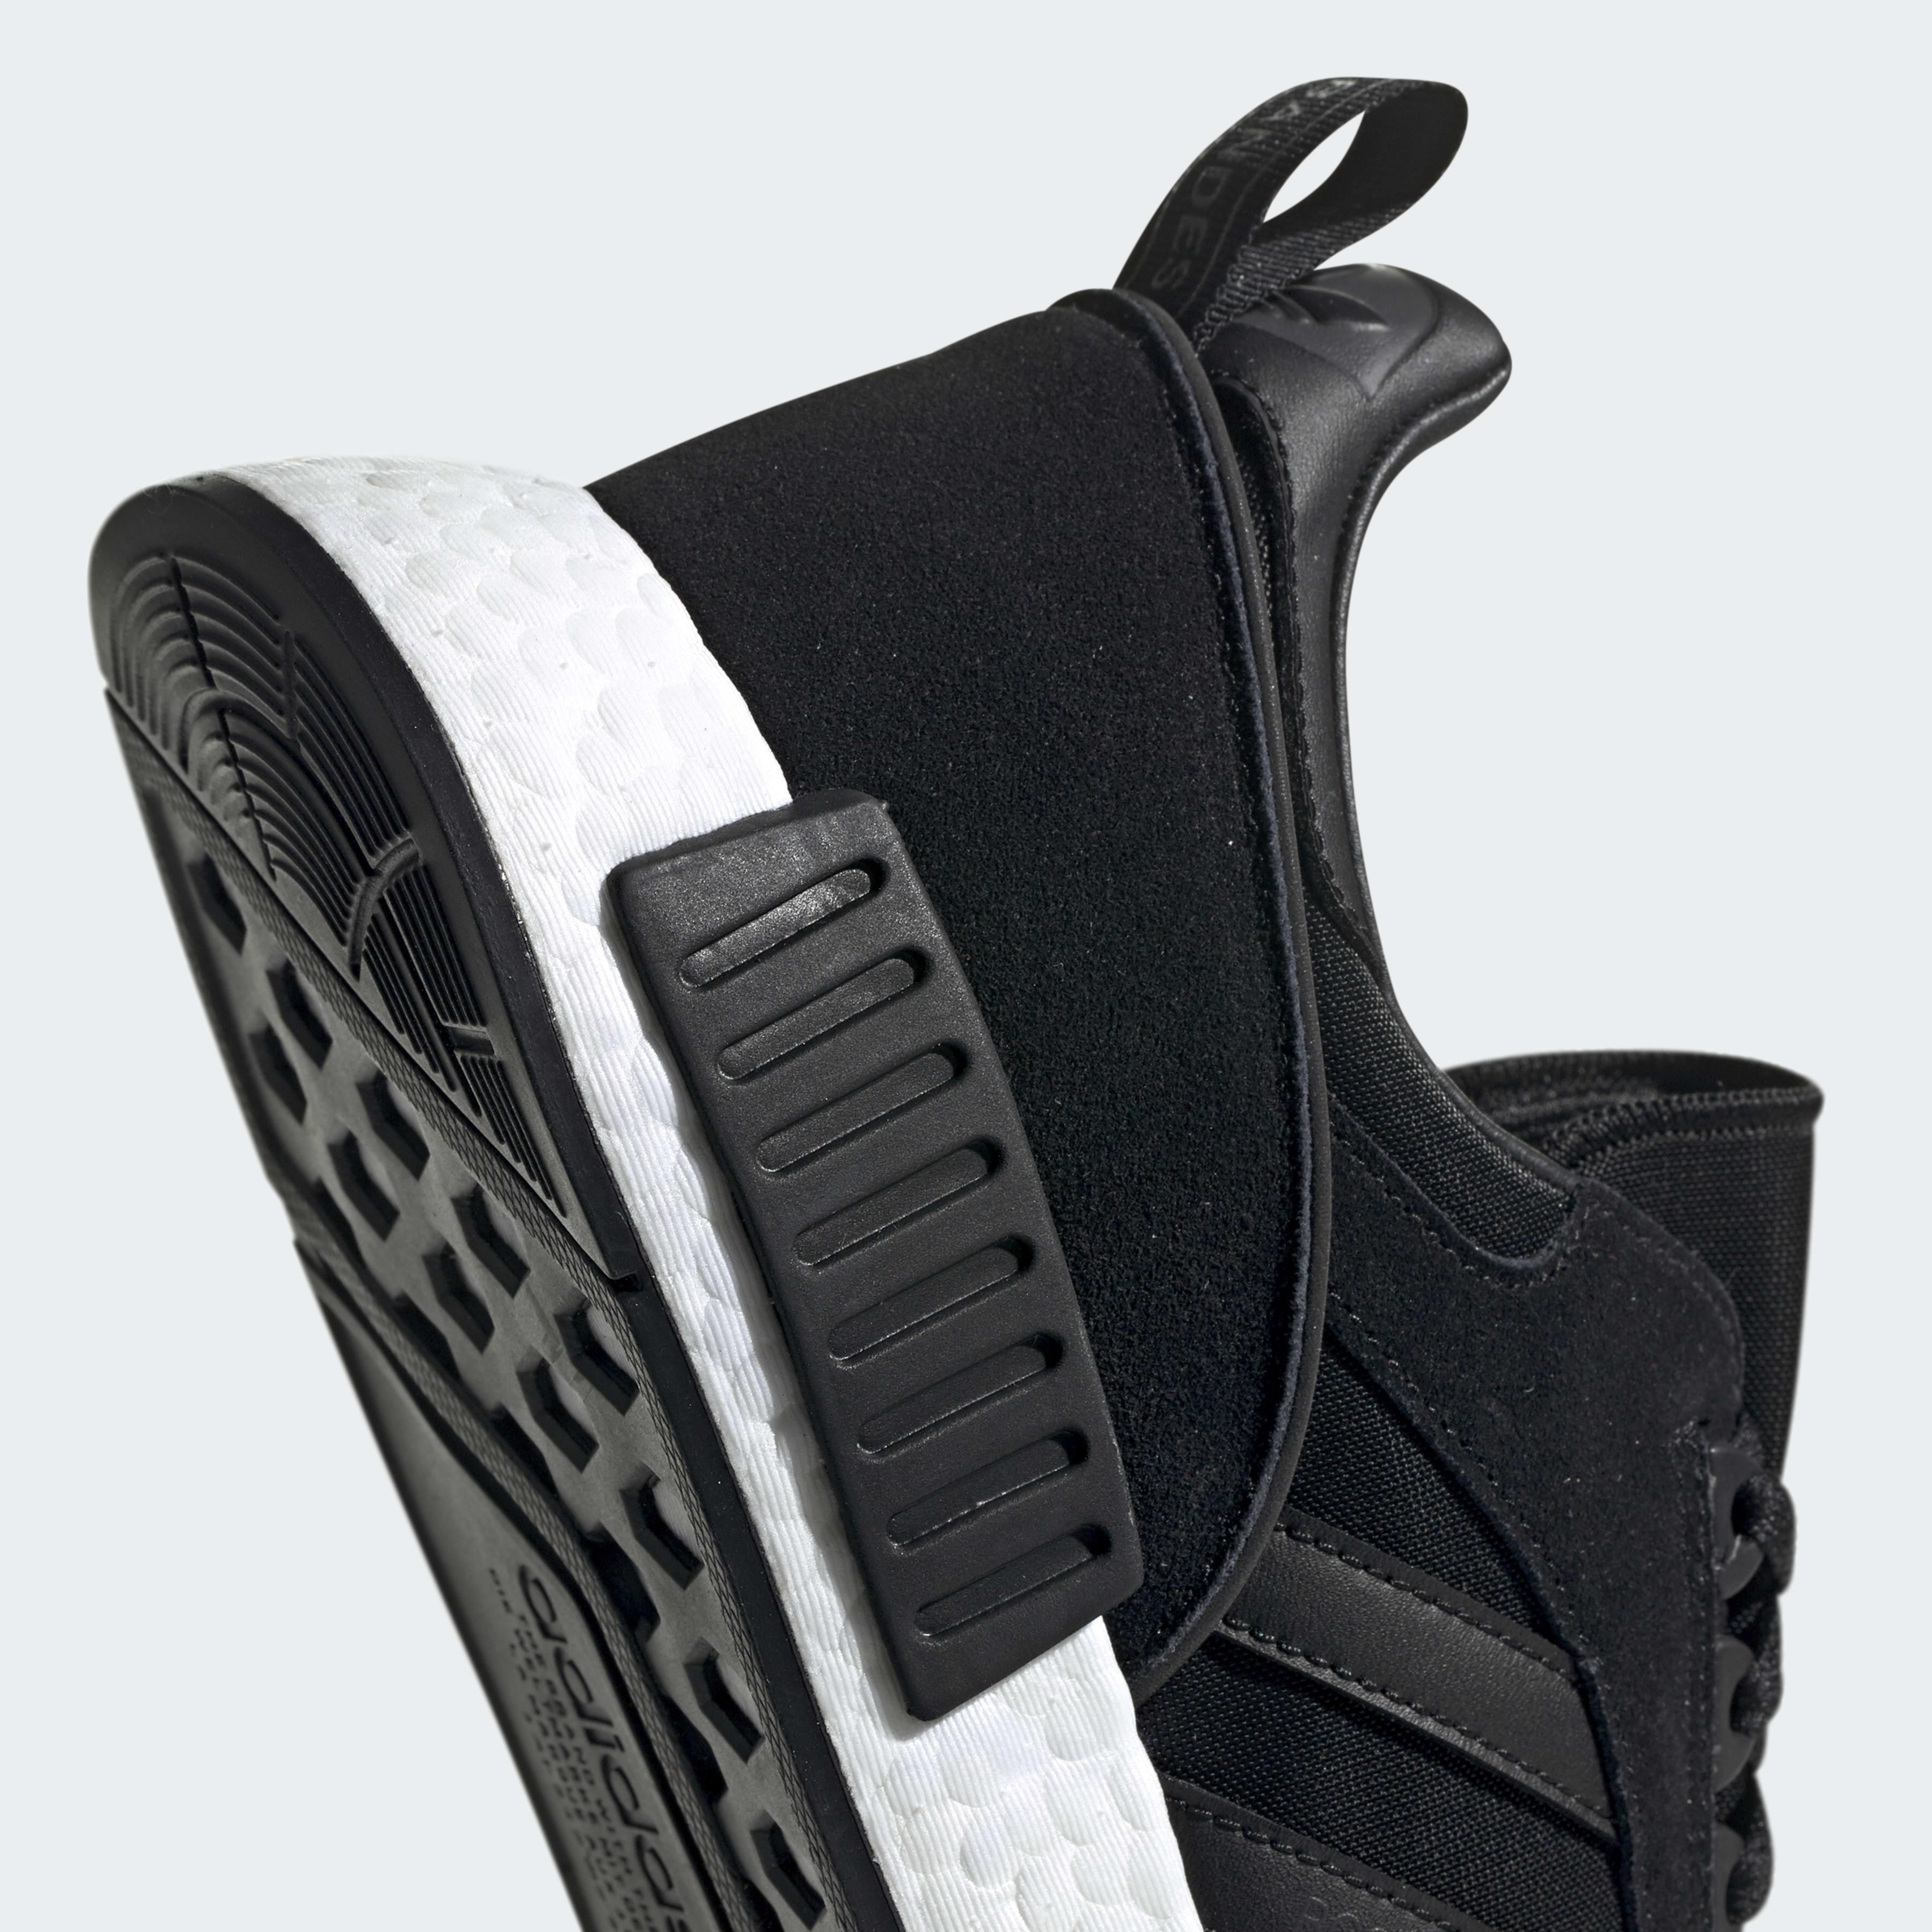 Schuh Adidas Boston Superxr1 Black Ybf76g ONnyvwP8m0